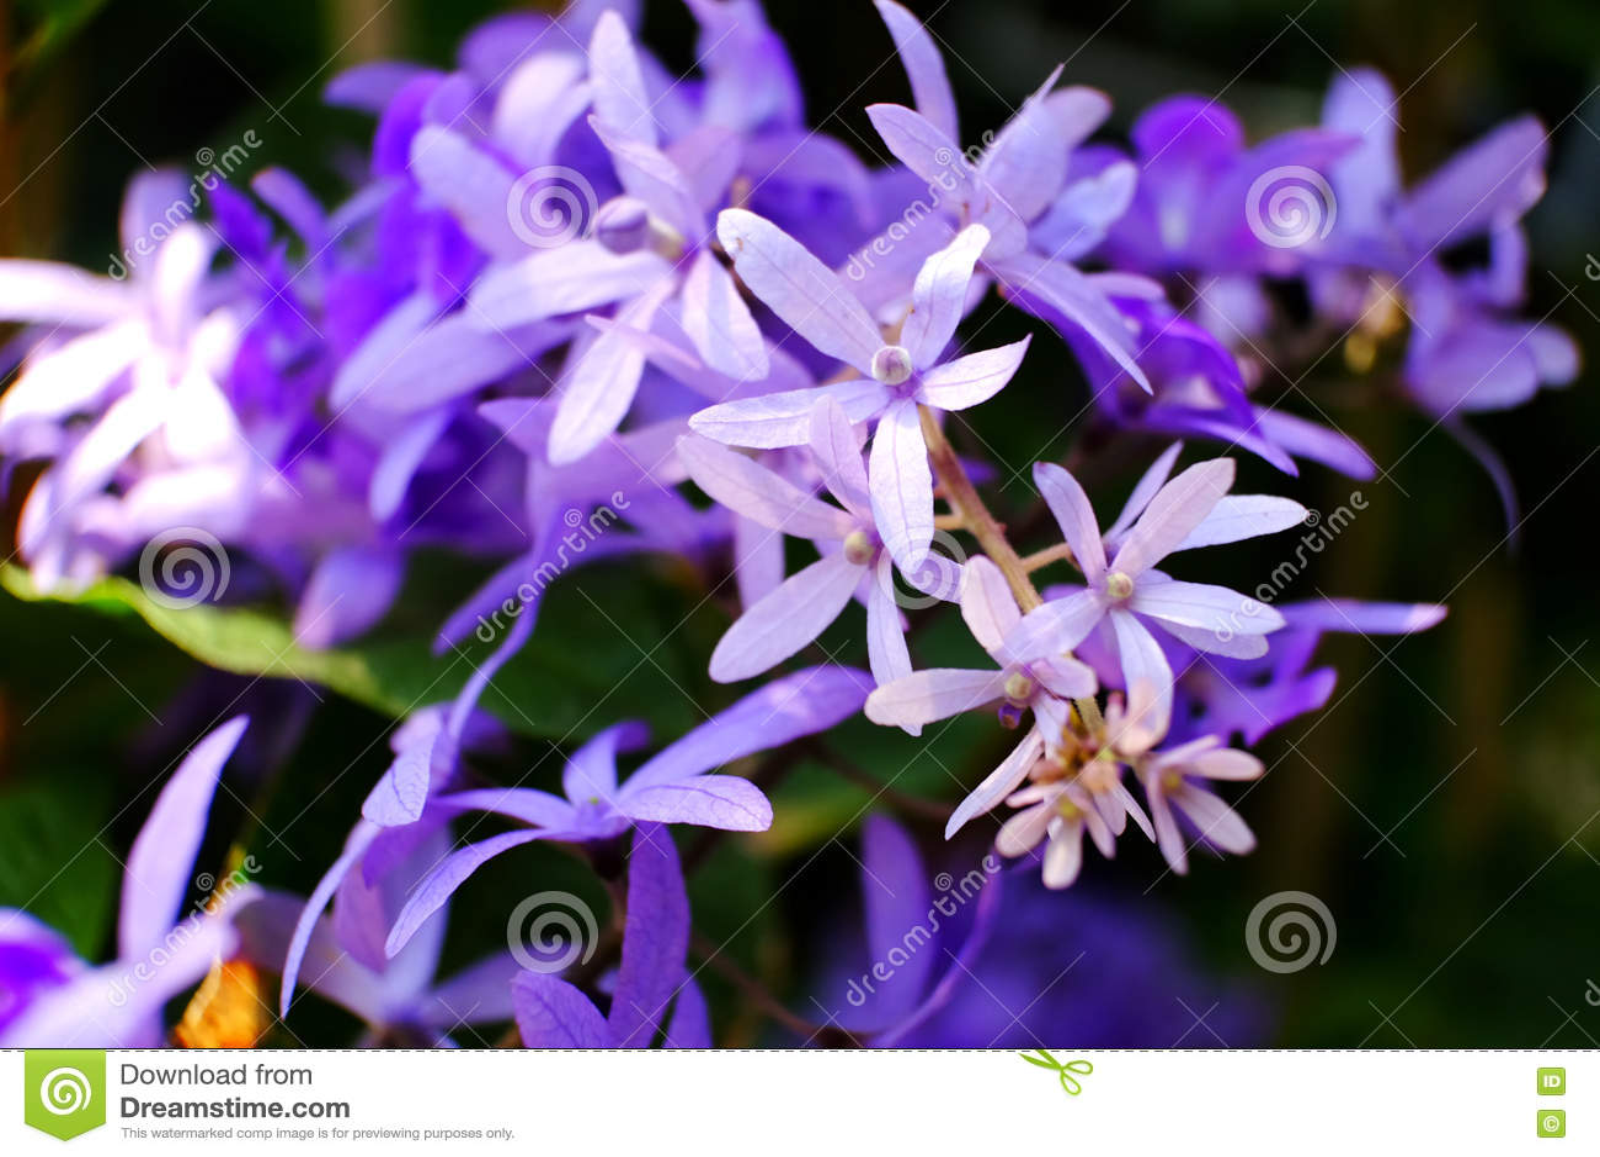 Beautiful Flower Name Is Sela Stock Photo Image Of Name Sela